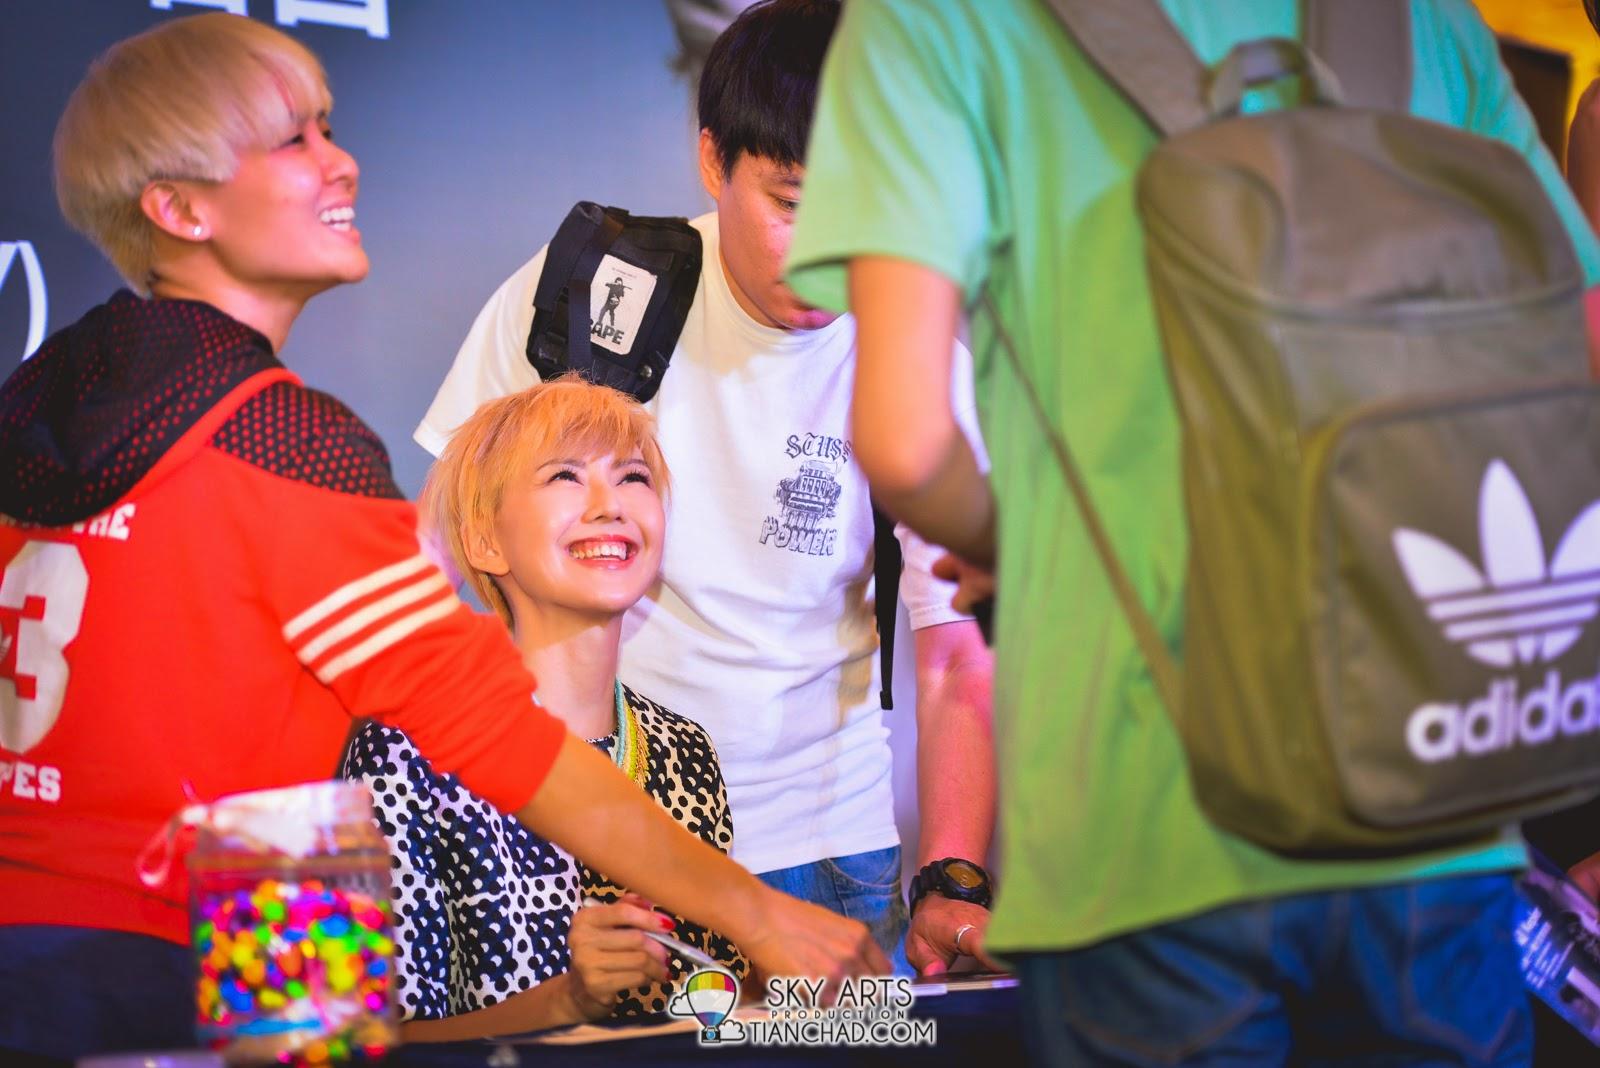 孫燕姿《克卜勒》大马签唱会 Stefanie Sun 《Kepler》 Autograph Session in Malaysia